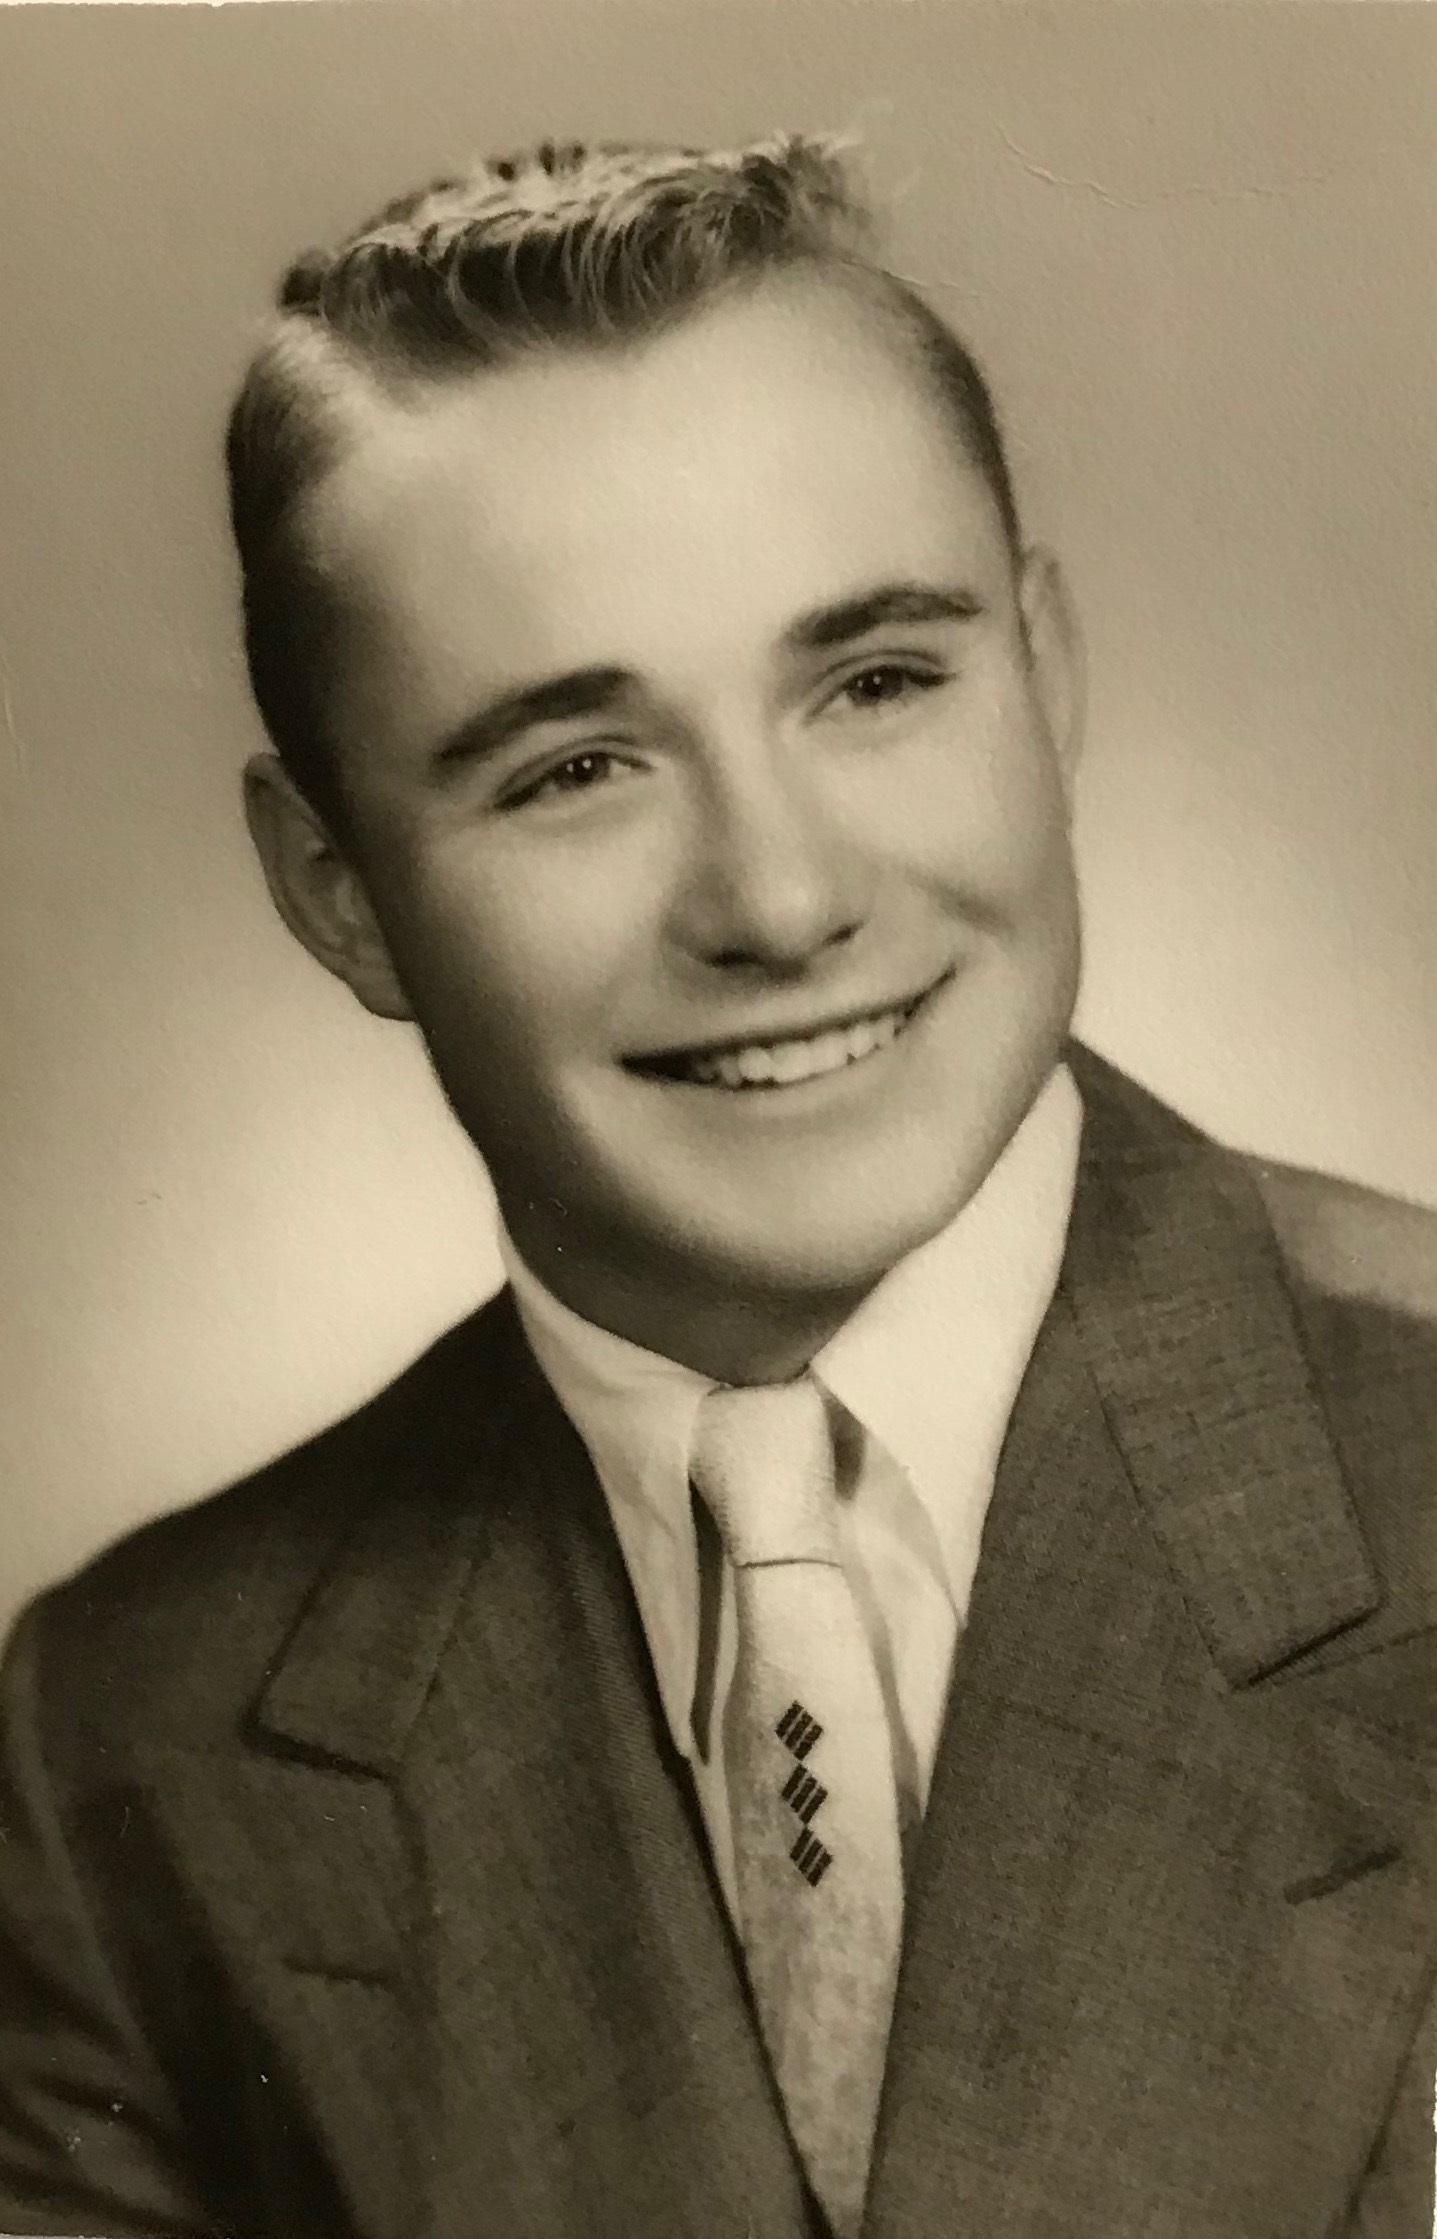 Don Rexford McCracken